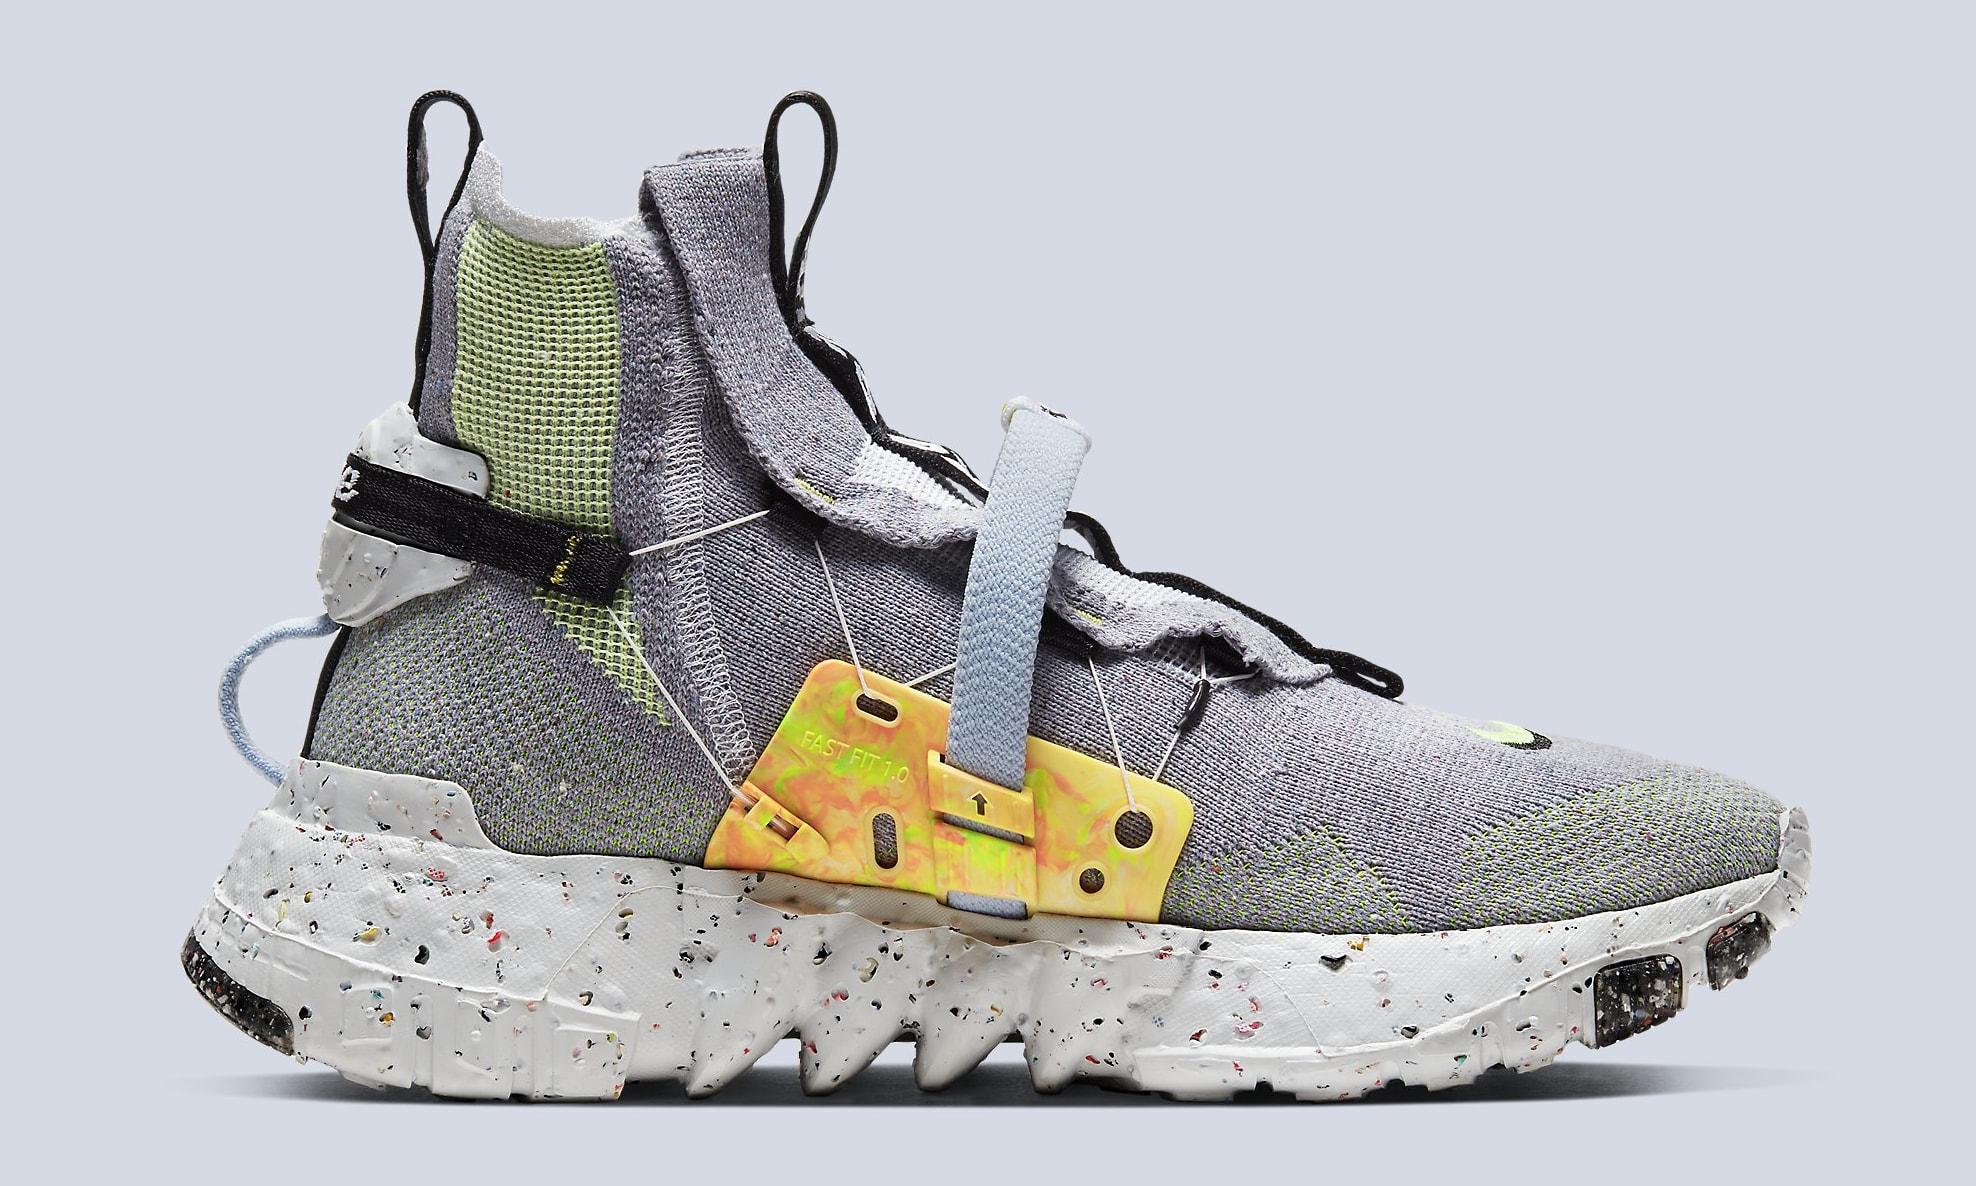 Nike Space Hippie 03 'Grey/Volt' CQ3989-002 Medial